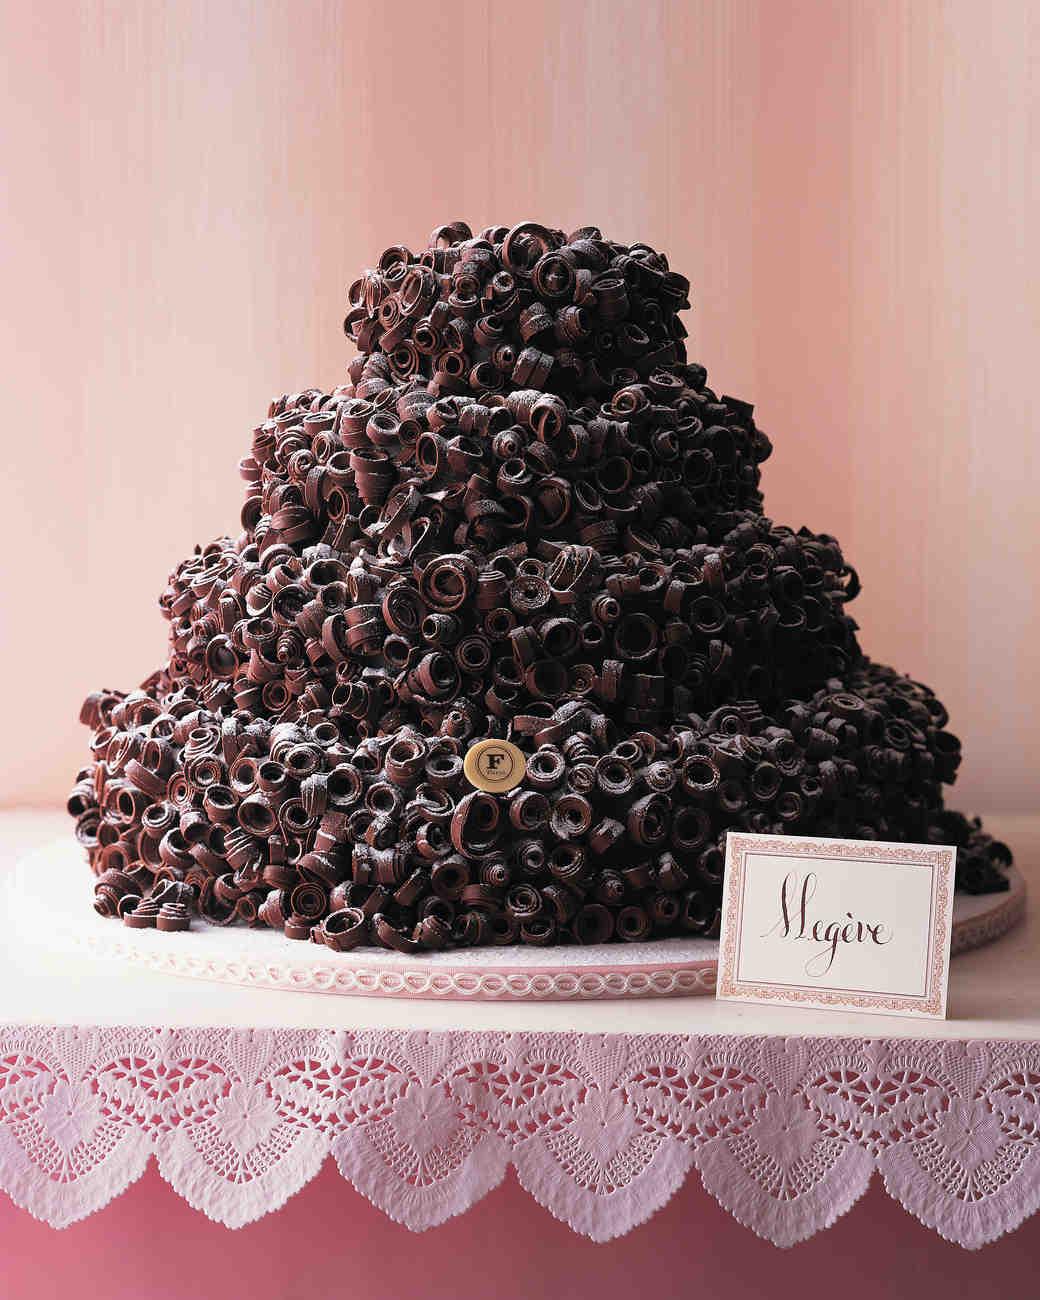 chocolate-cake-ideas-ml397g3-megeve-1114.jpg